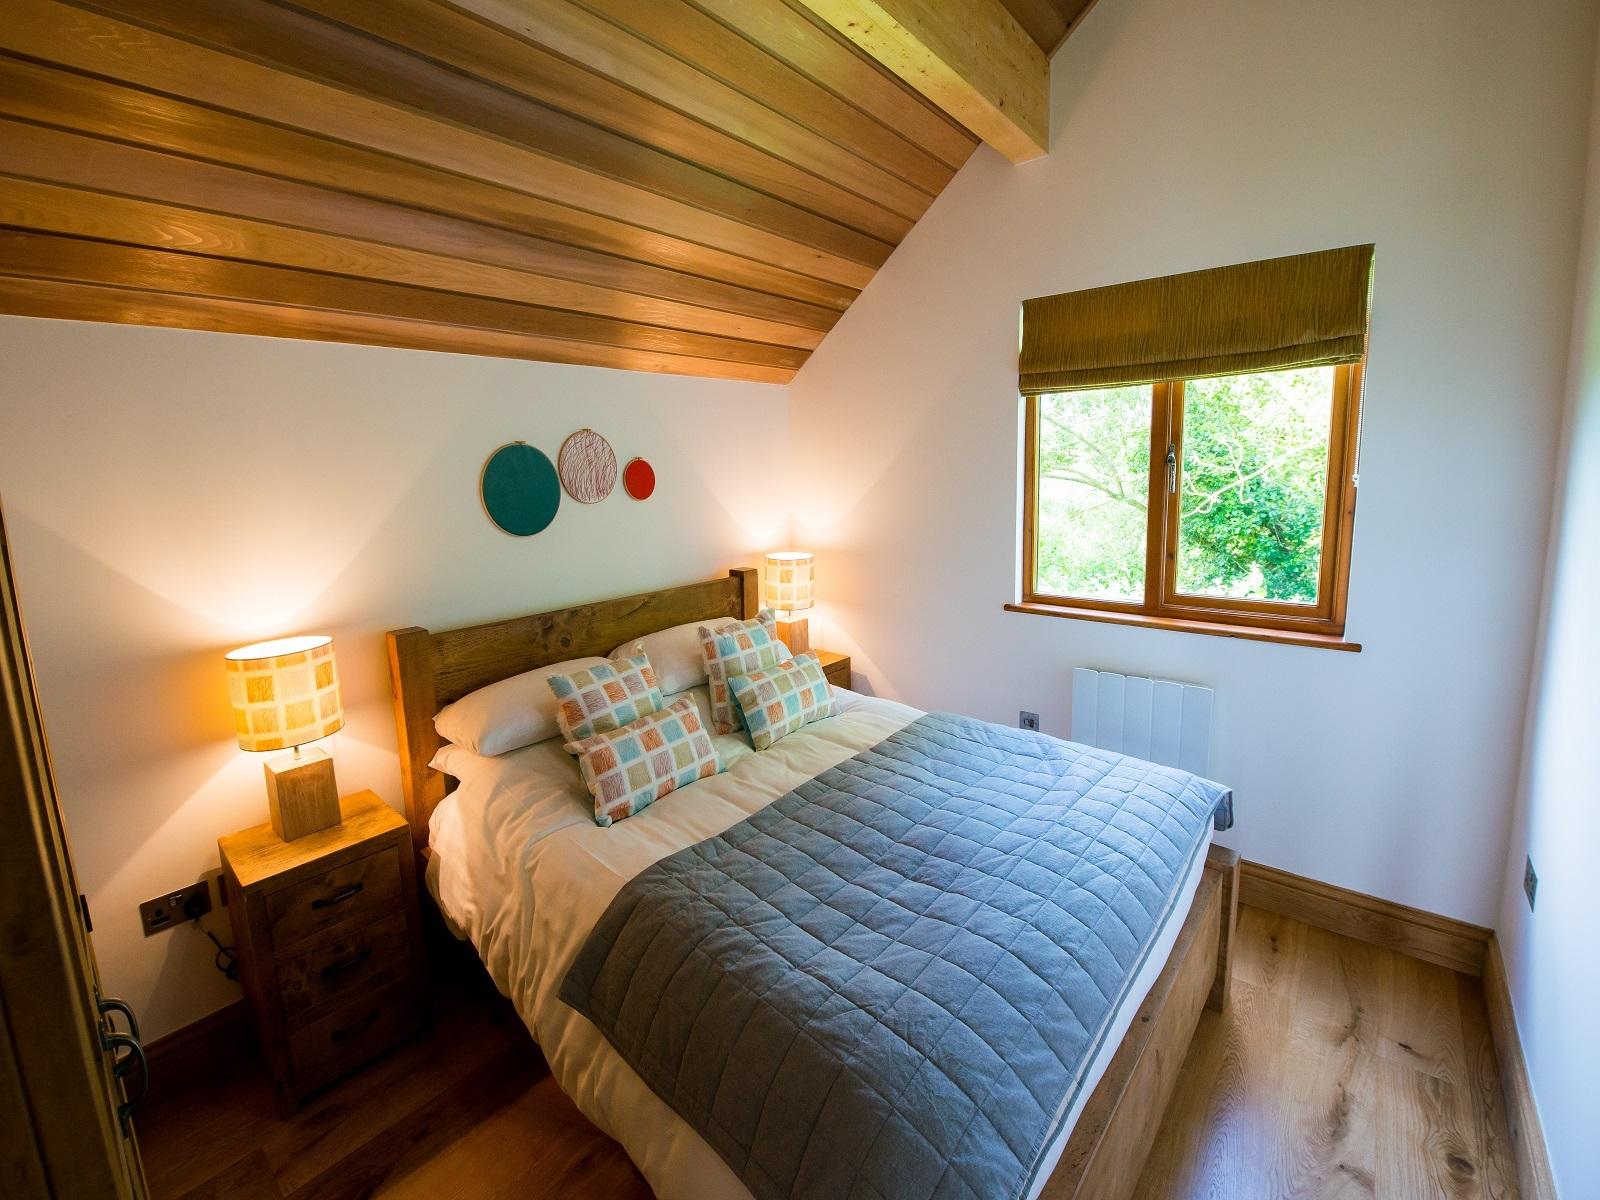 Lodge-Standard-Wet room-Bittern Lodge - Base Rate